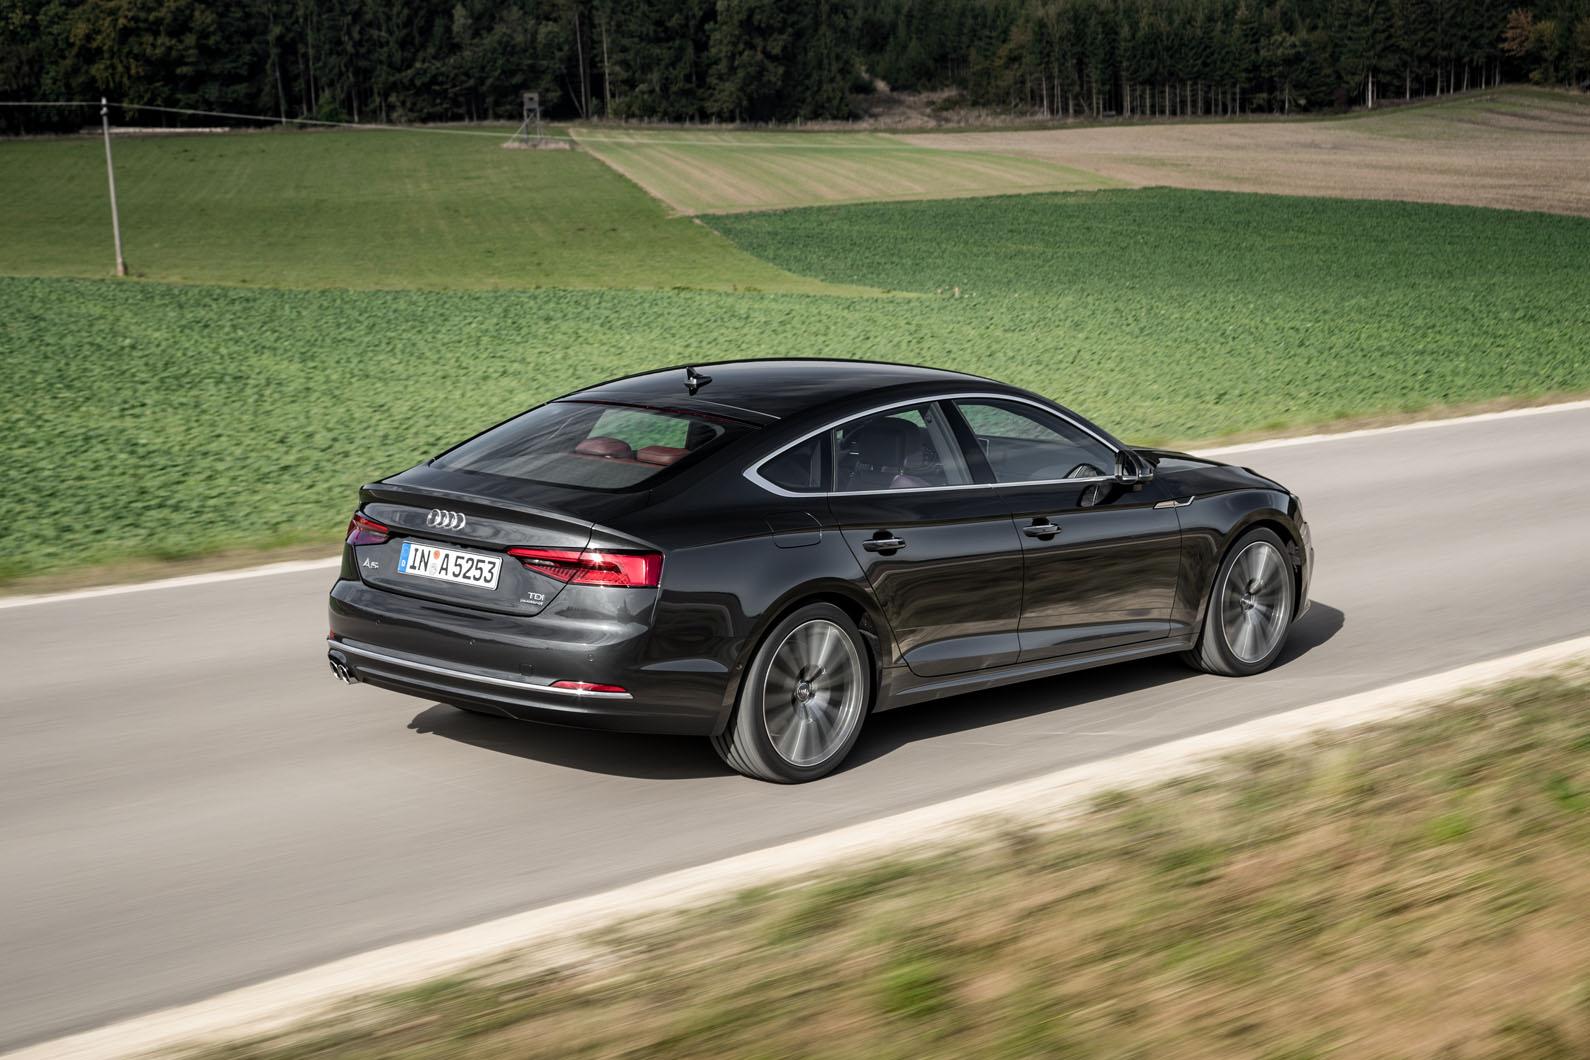 Kelebihan Kekurangan Audi A5 3.0 Murah Berkualitas